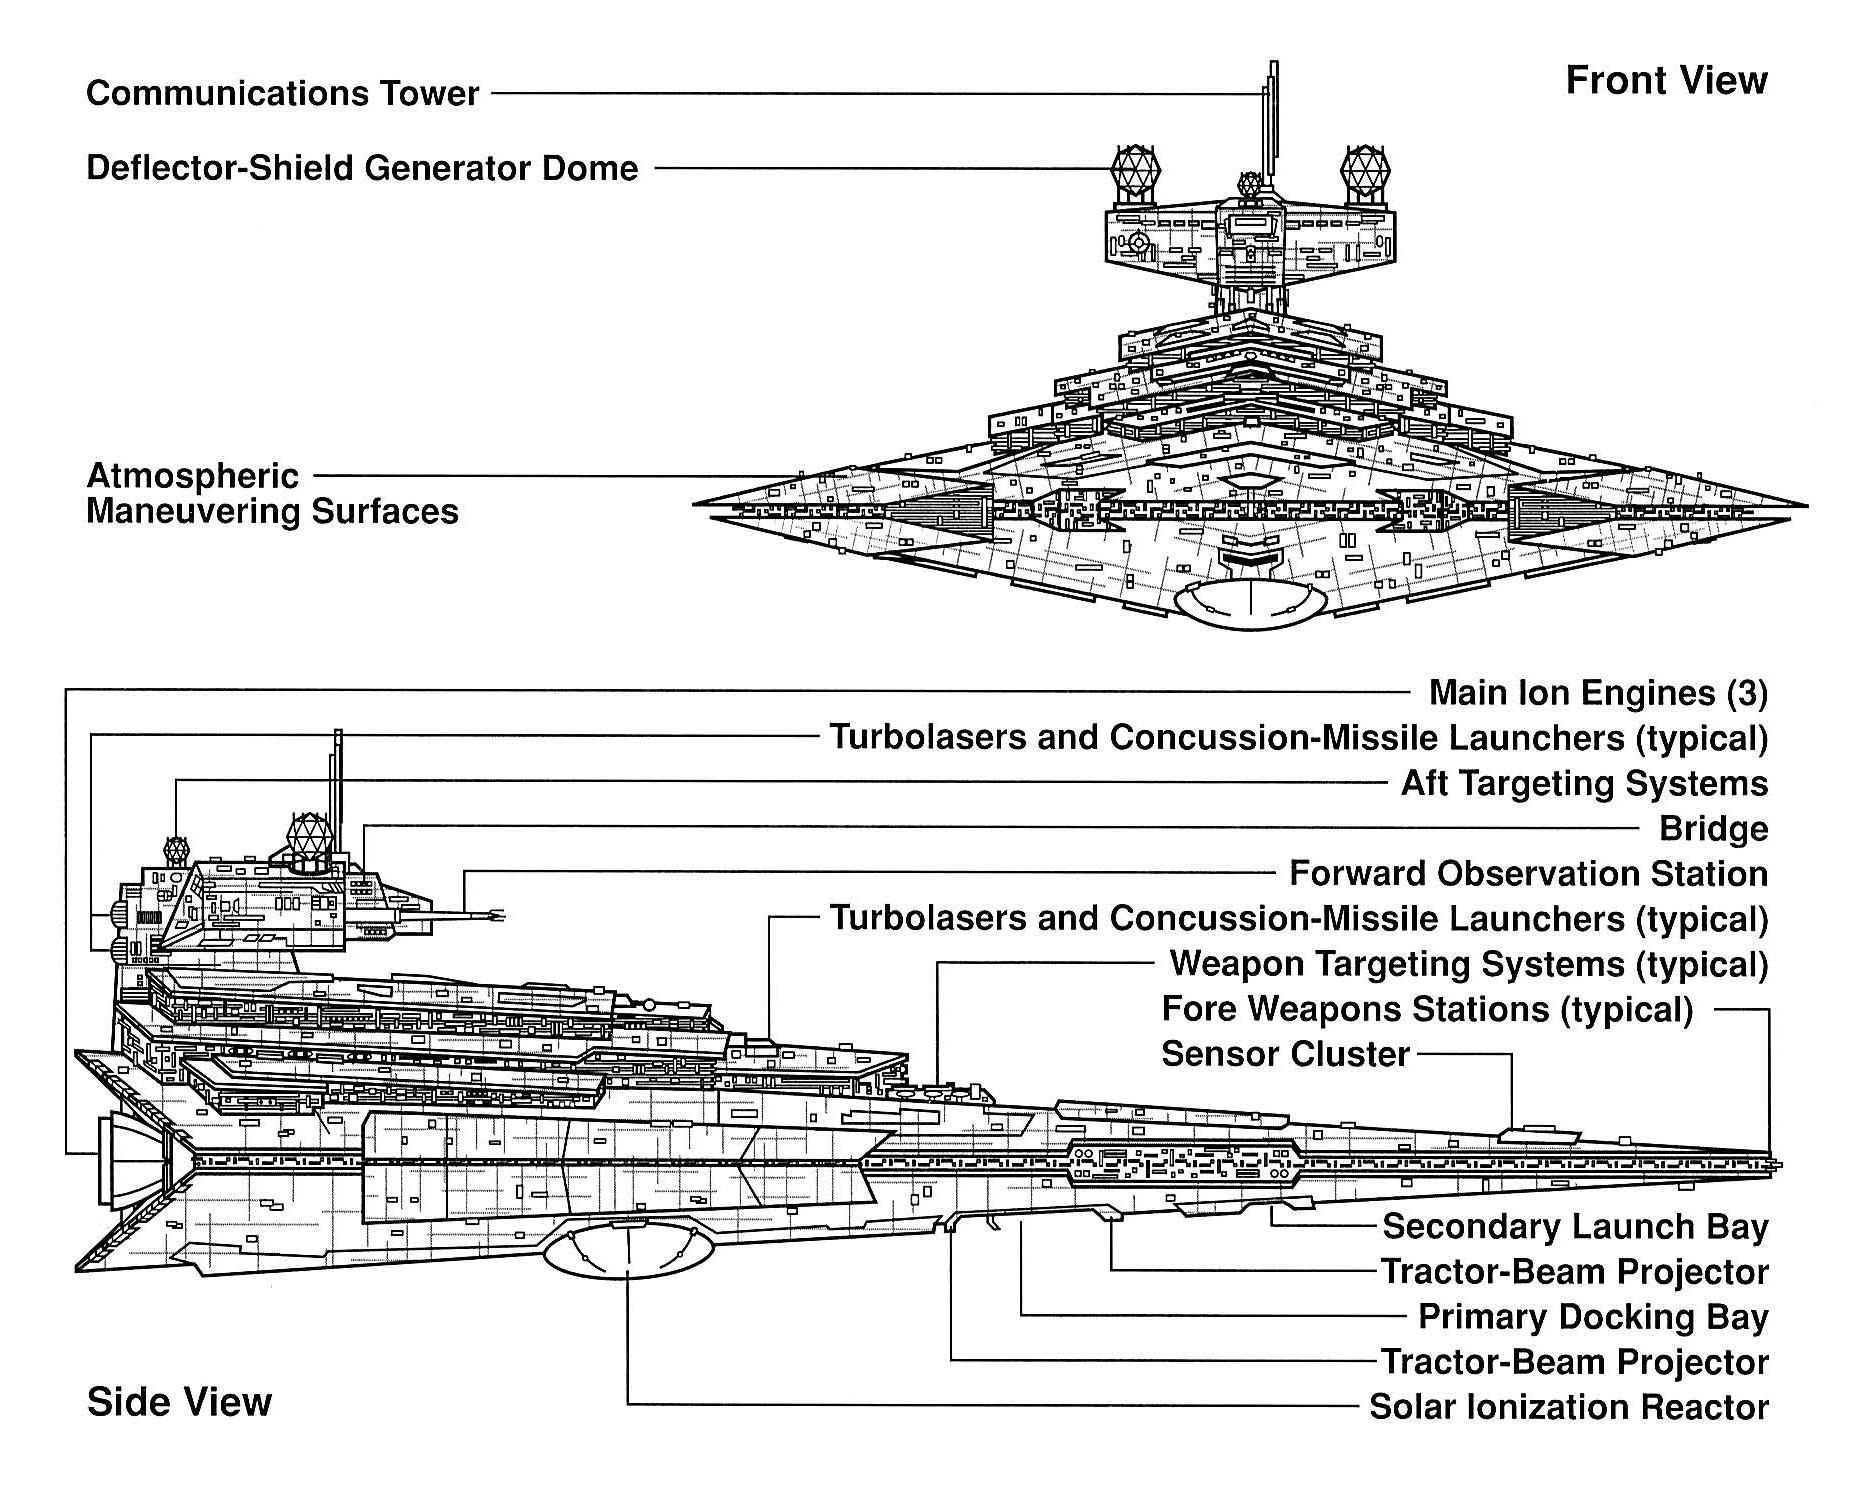 Image Vsd Egvv Wookieepedia Fandom Powered By Wikia Bridge Diagram Related Keywords Suggestions Beam